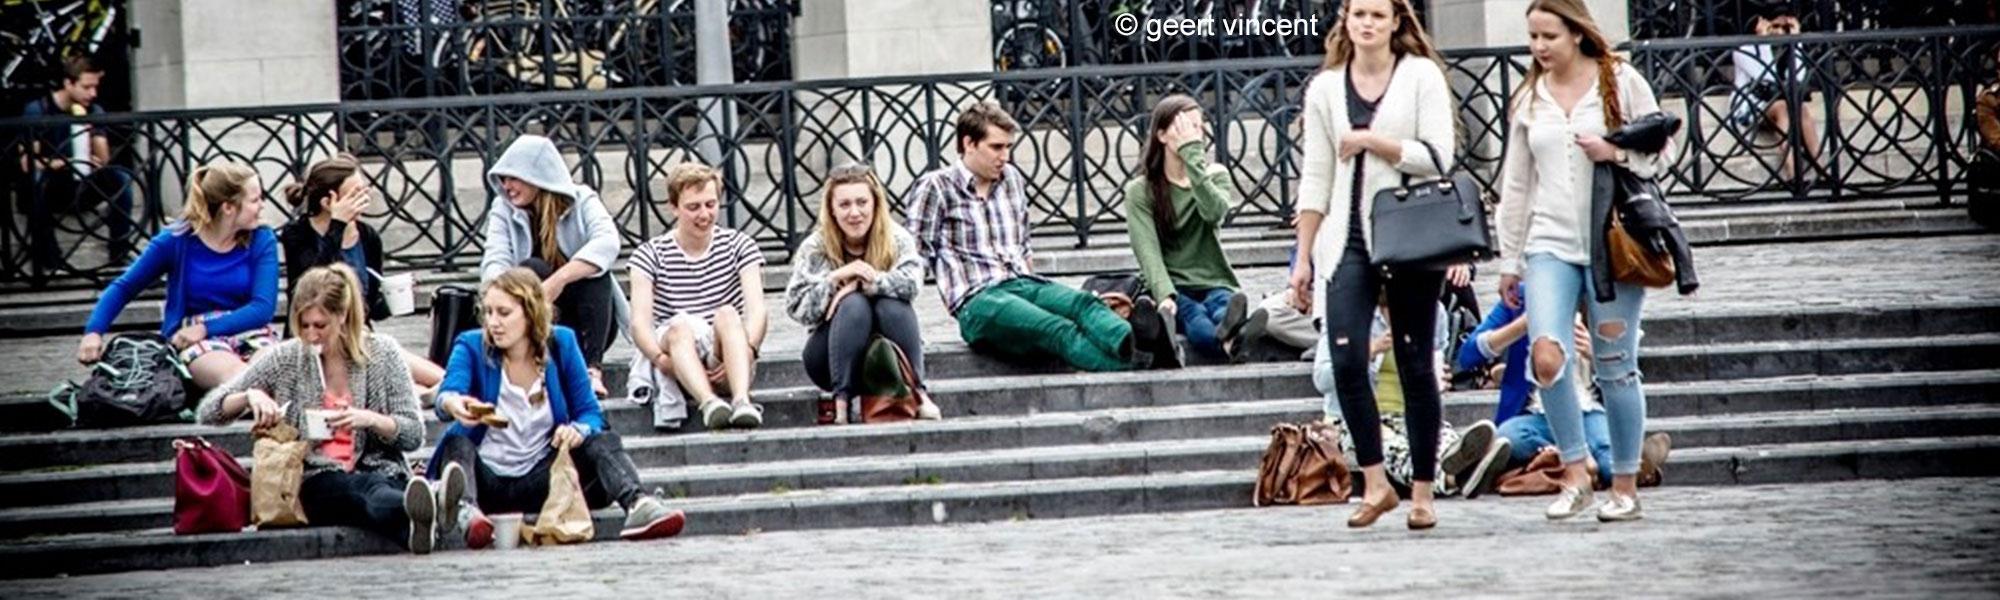 Leuven Live: reportage over Leuvense wist-je-datjes